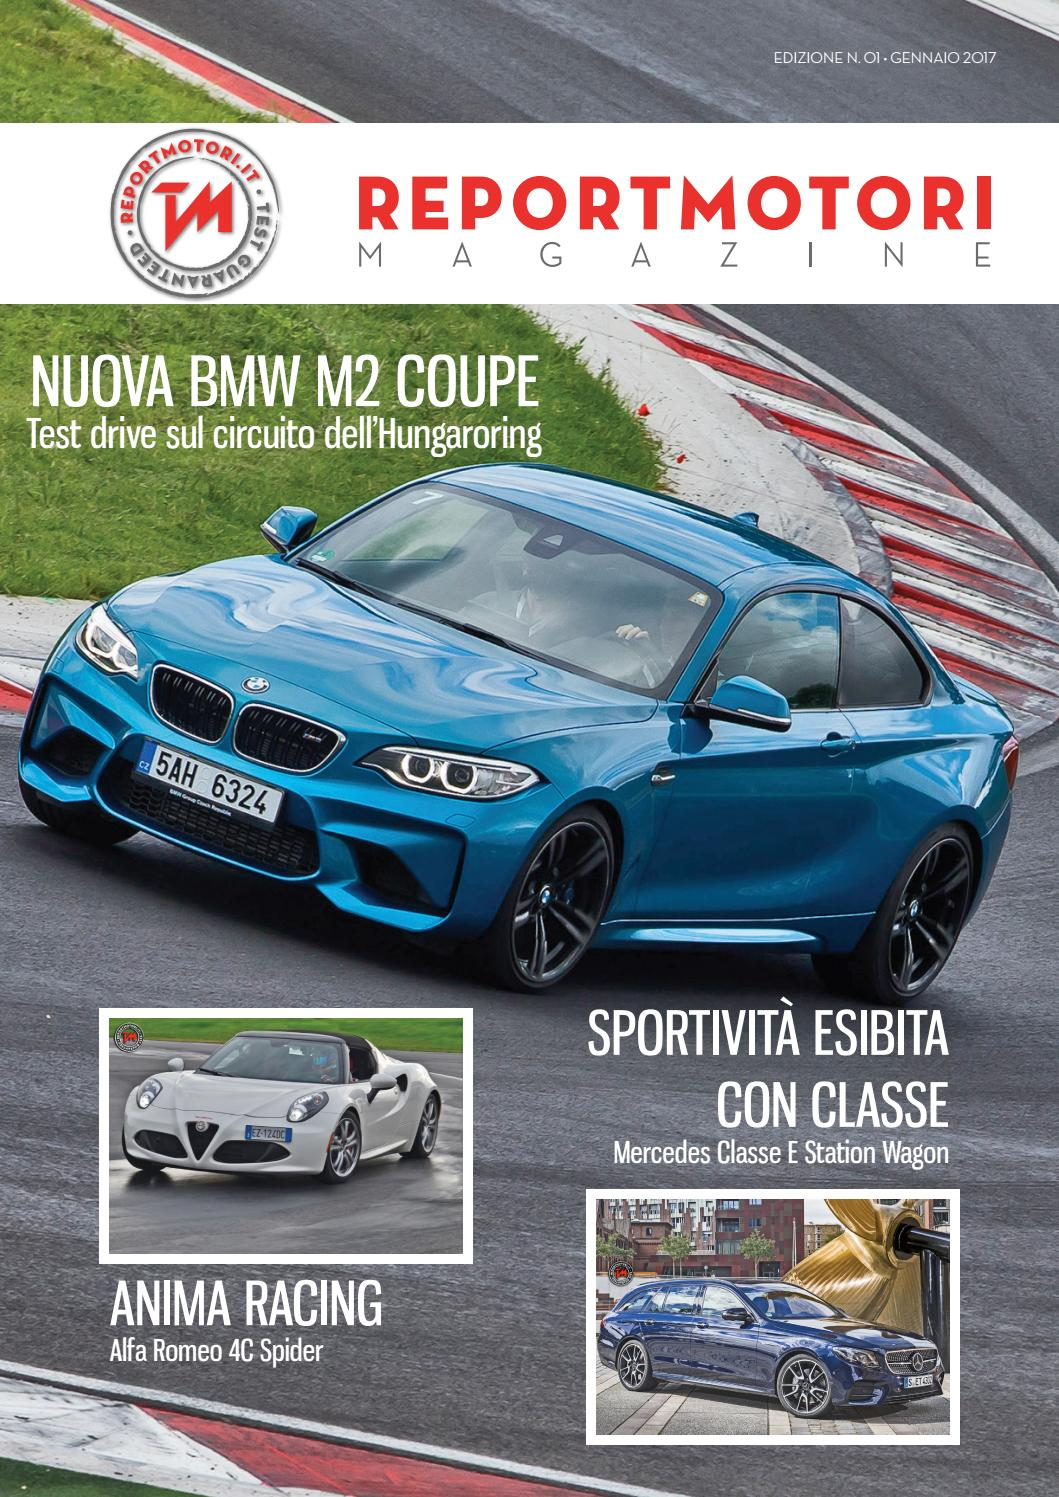 ROSSO, M RETE CAFE RACER AMAS The Best GUANTI DA GUIDA VINTAGE AUTO MOTO EPOCA FULL FINGER IN PELLE